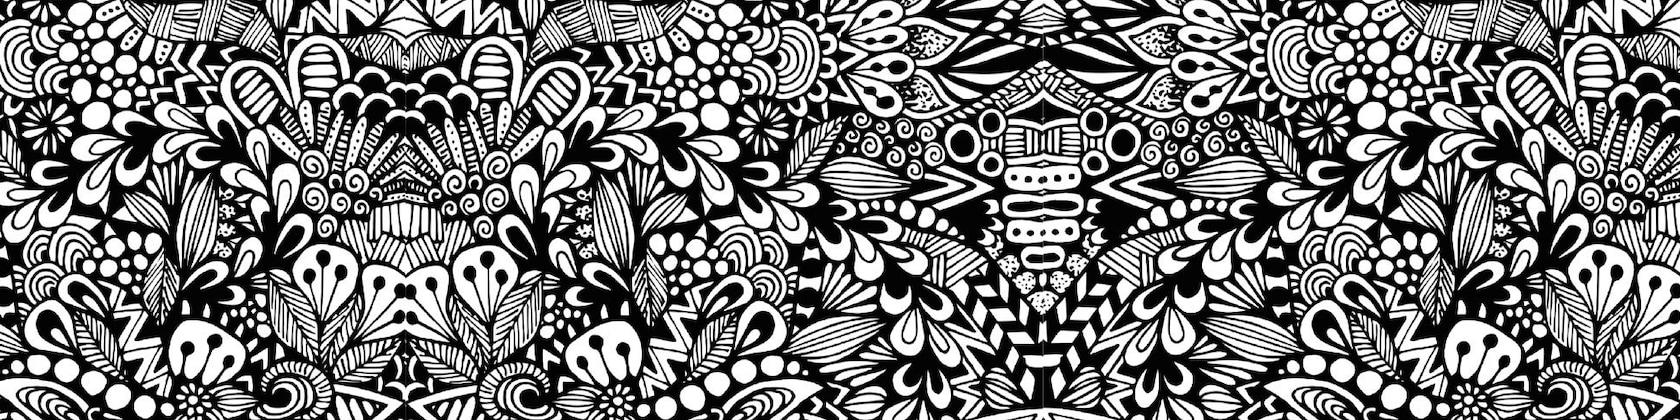 Zenspire Designs By ZenspireDesigns On Etsy